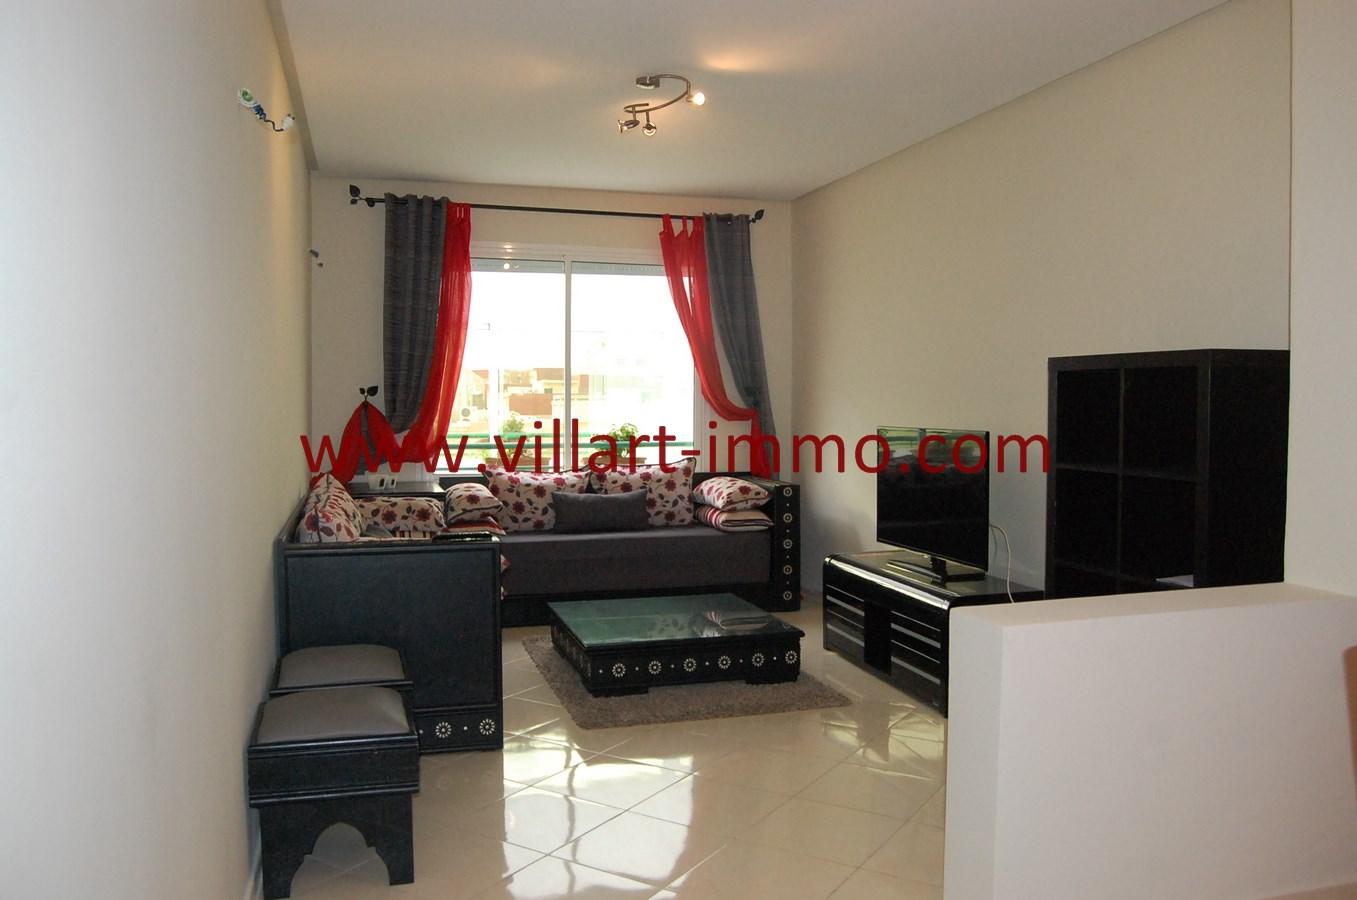 2-Vente-Appartement-Tanger-Salon 2-VA480-Villart Immo